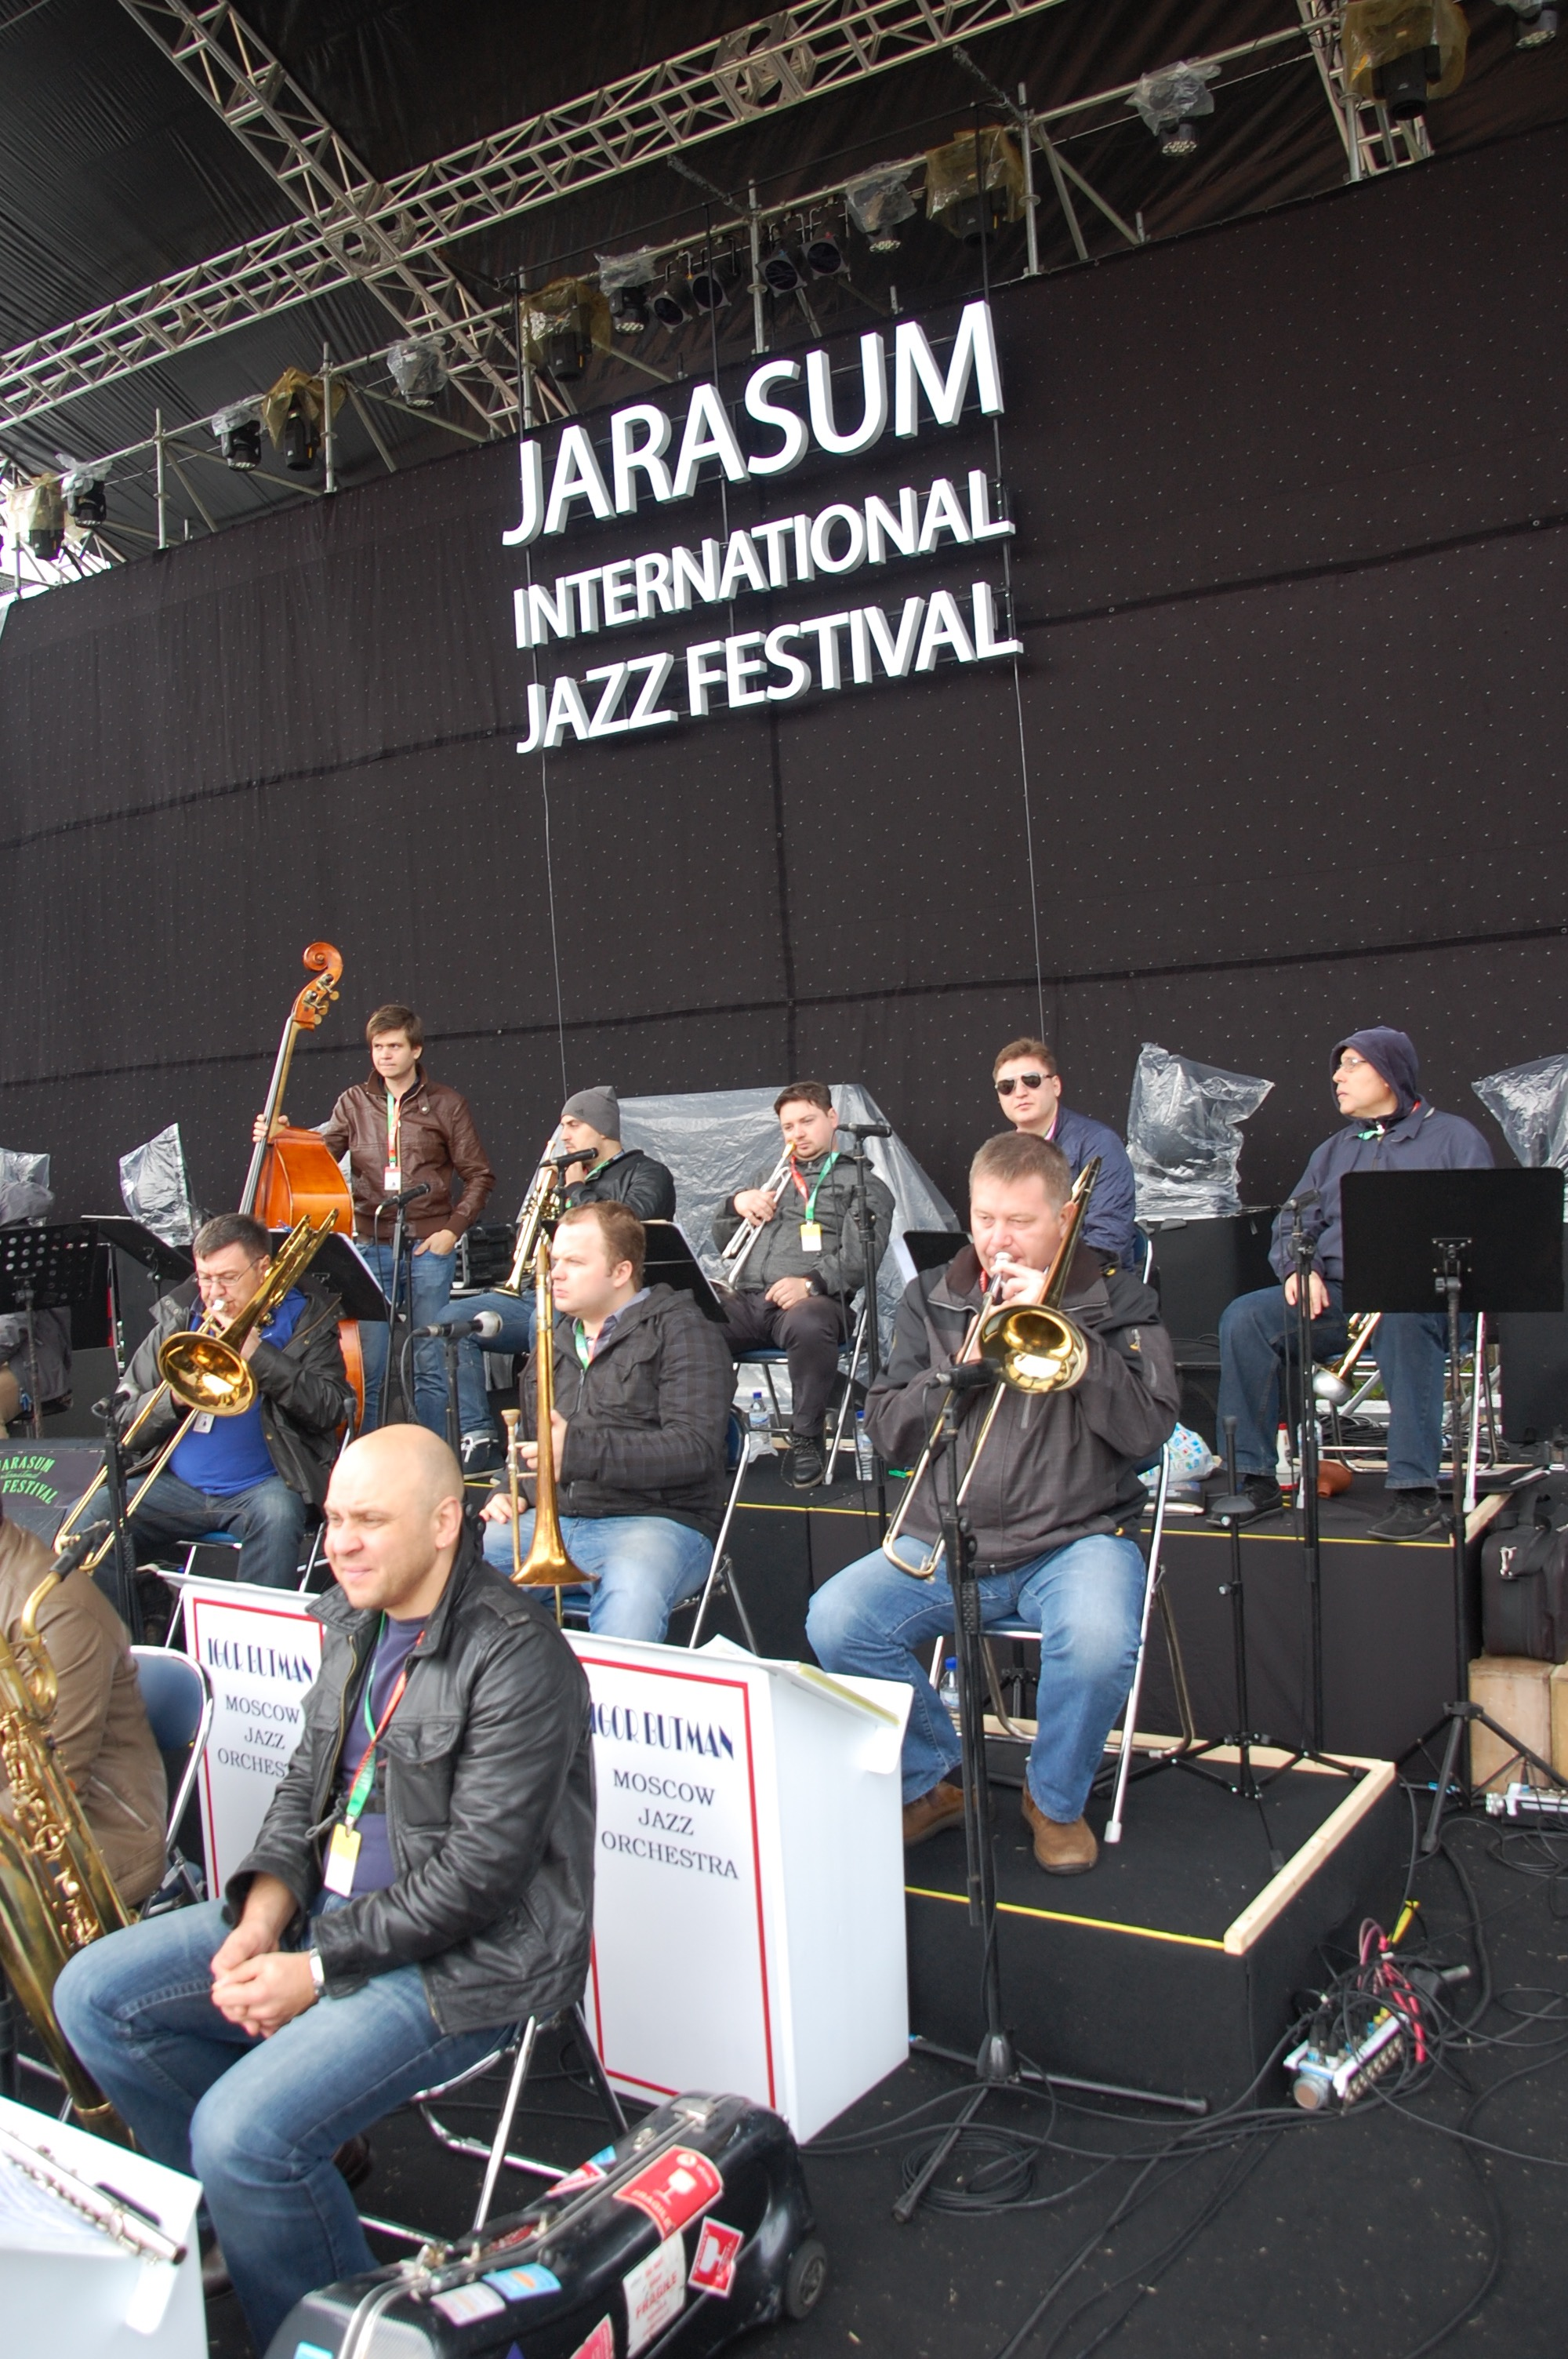 Jarasum Jazz Fest, Korea 2015